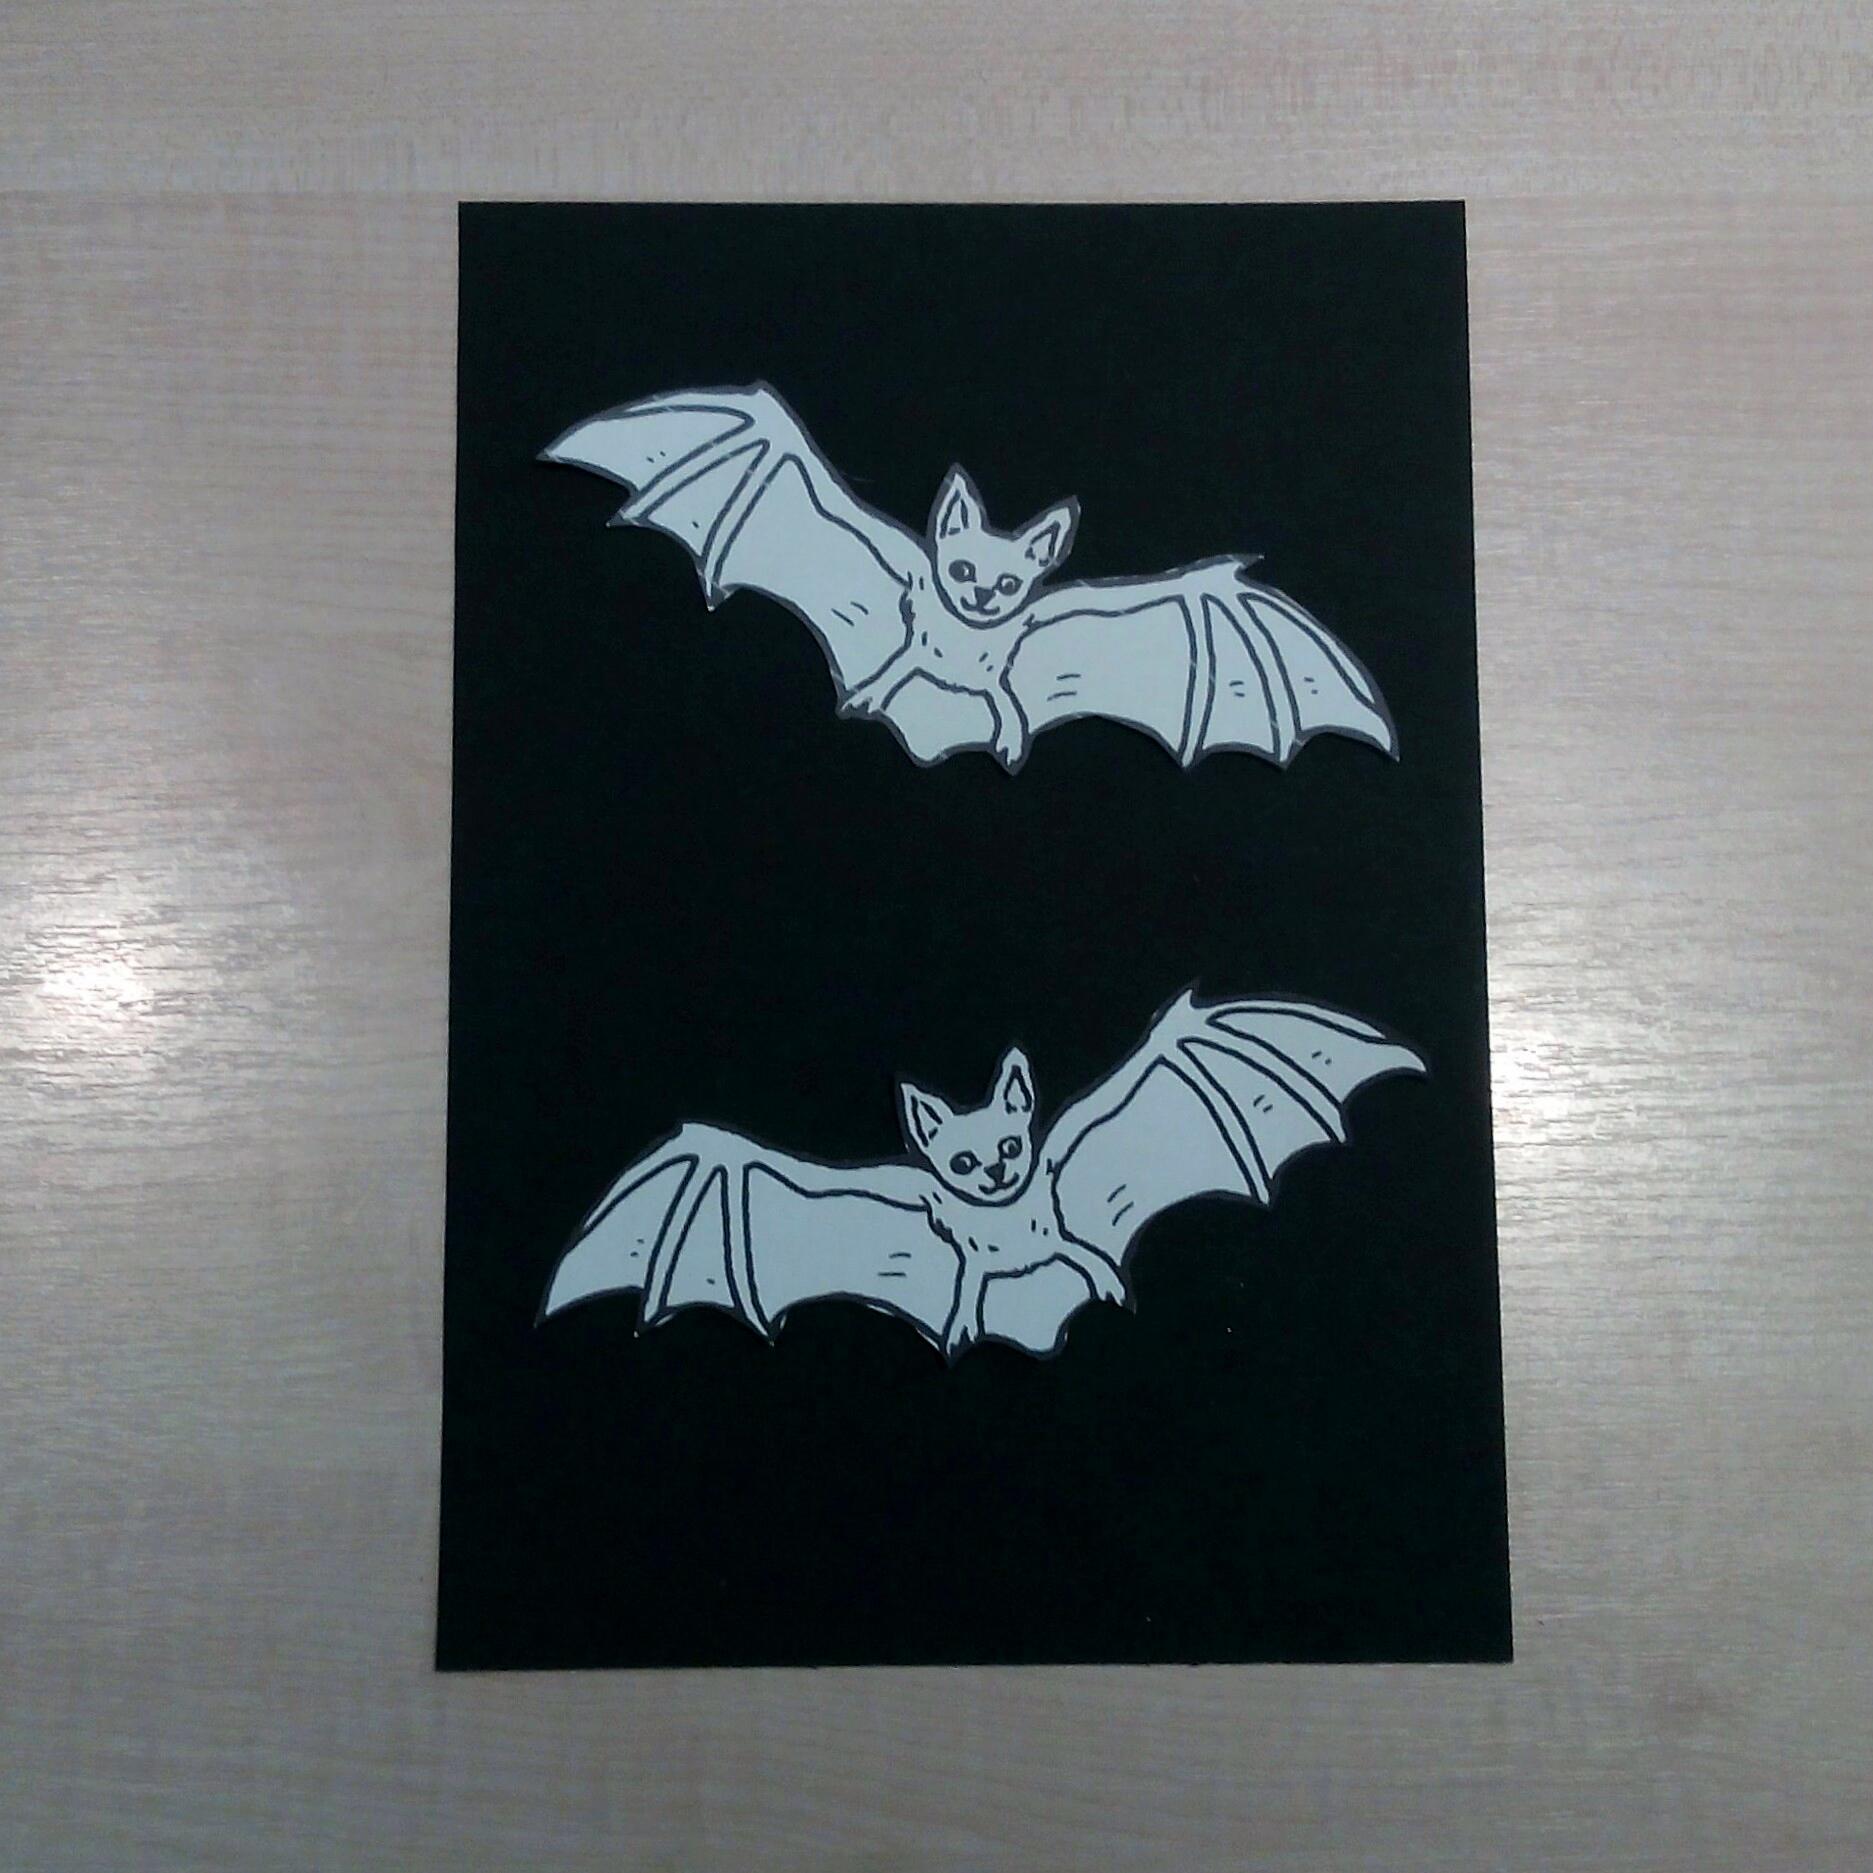 Fledermaus Bild Als Halloween Deko Kreativ Blog Diy Gadgets